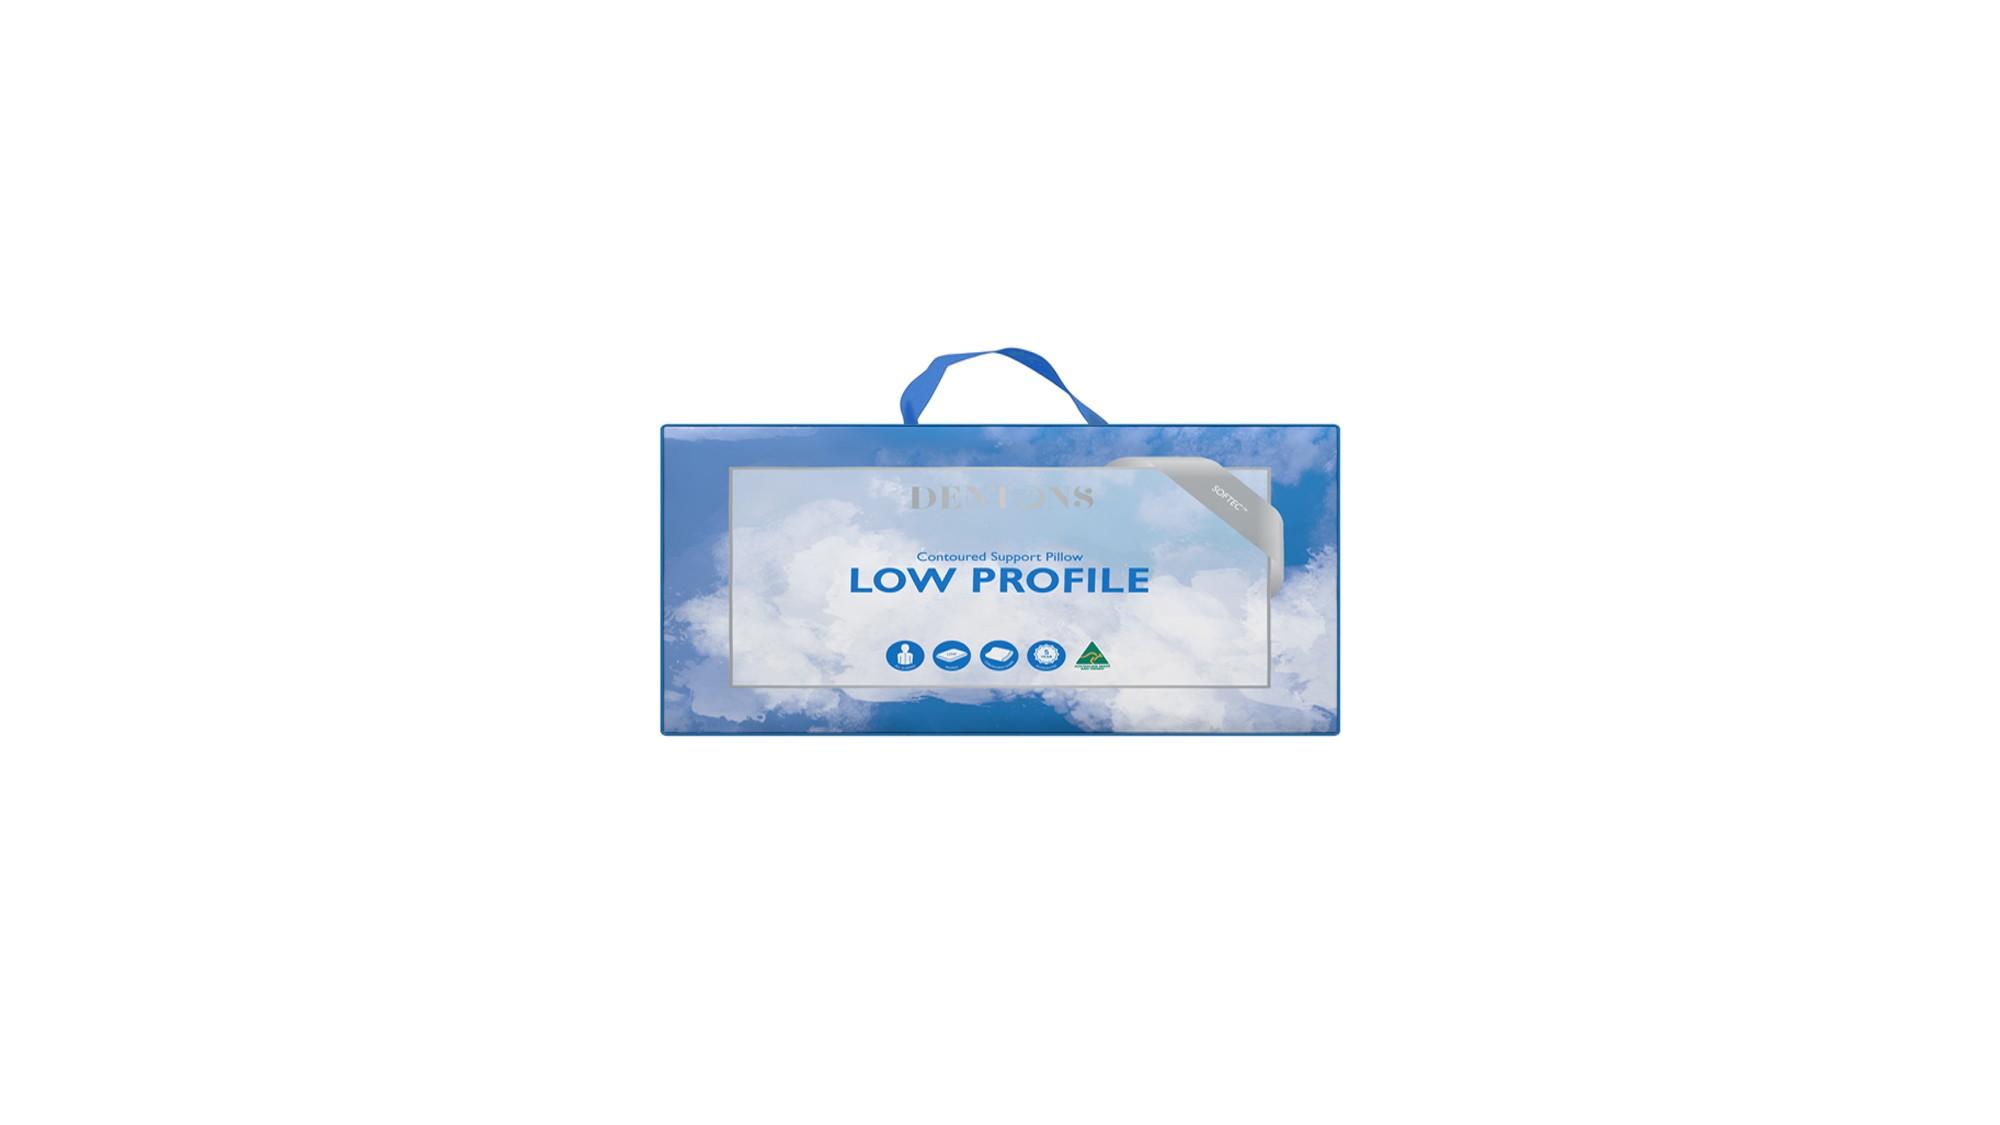 Dentons Low Profile Pillow